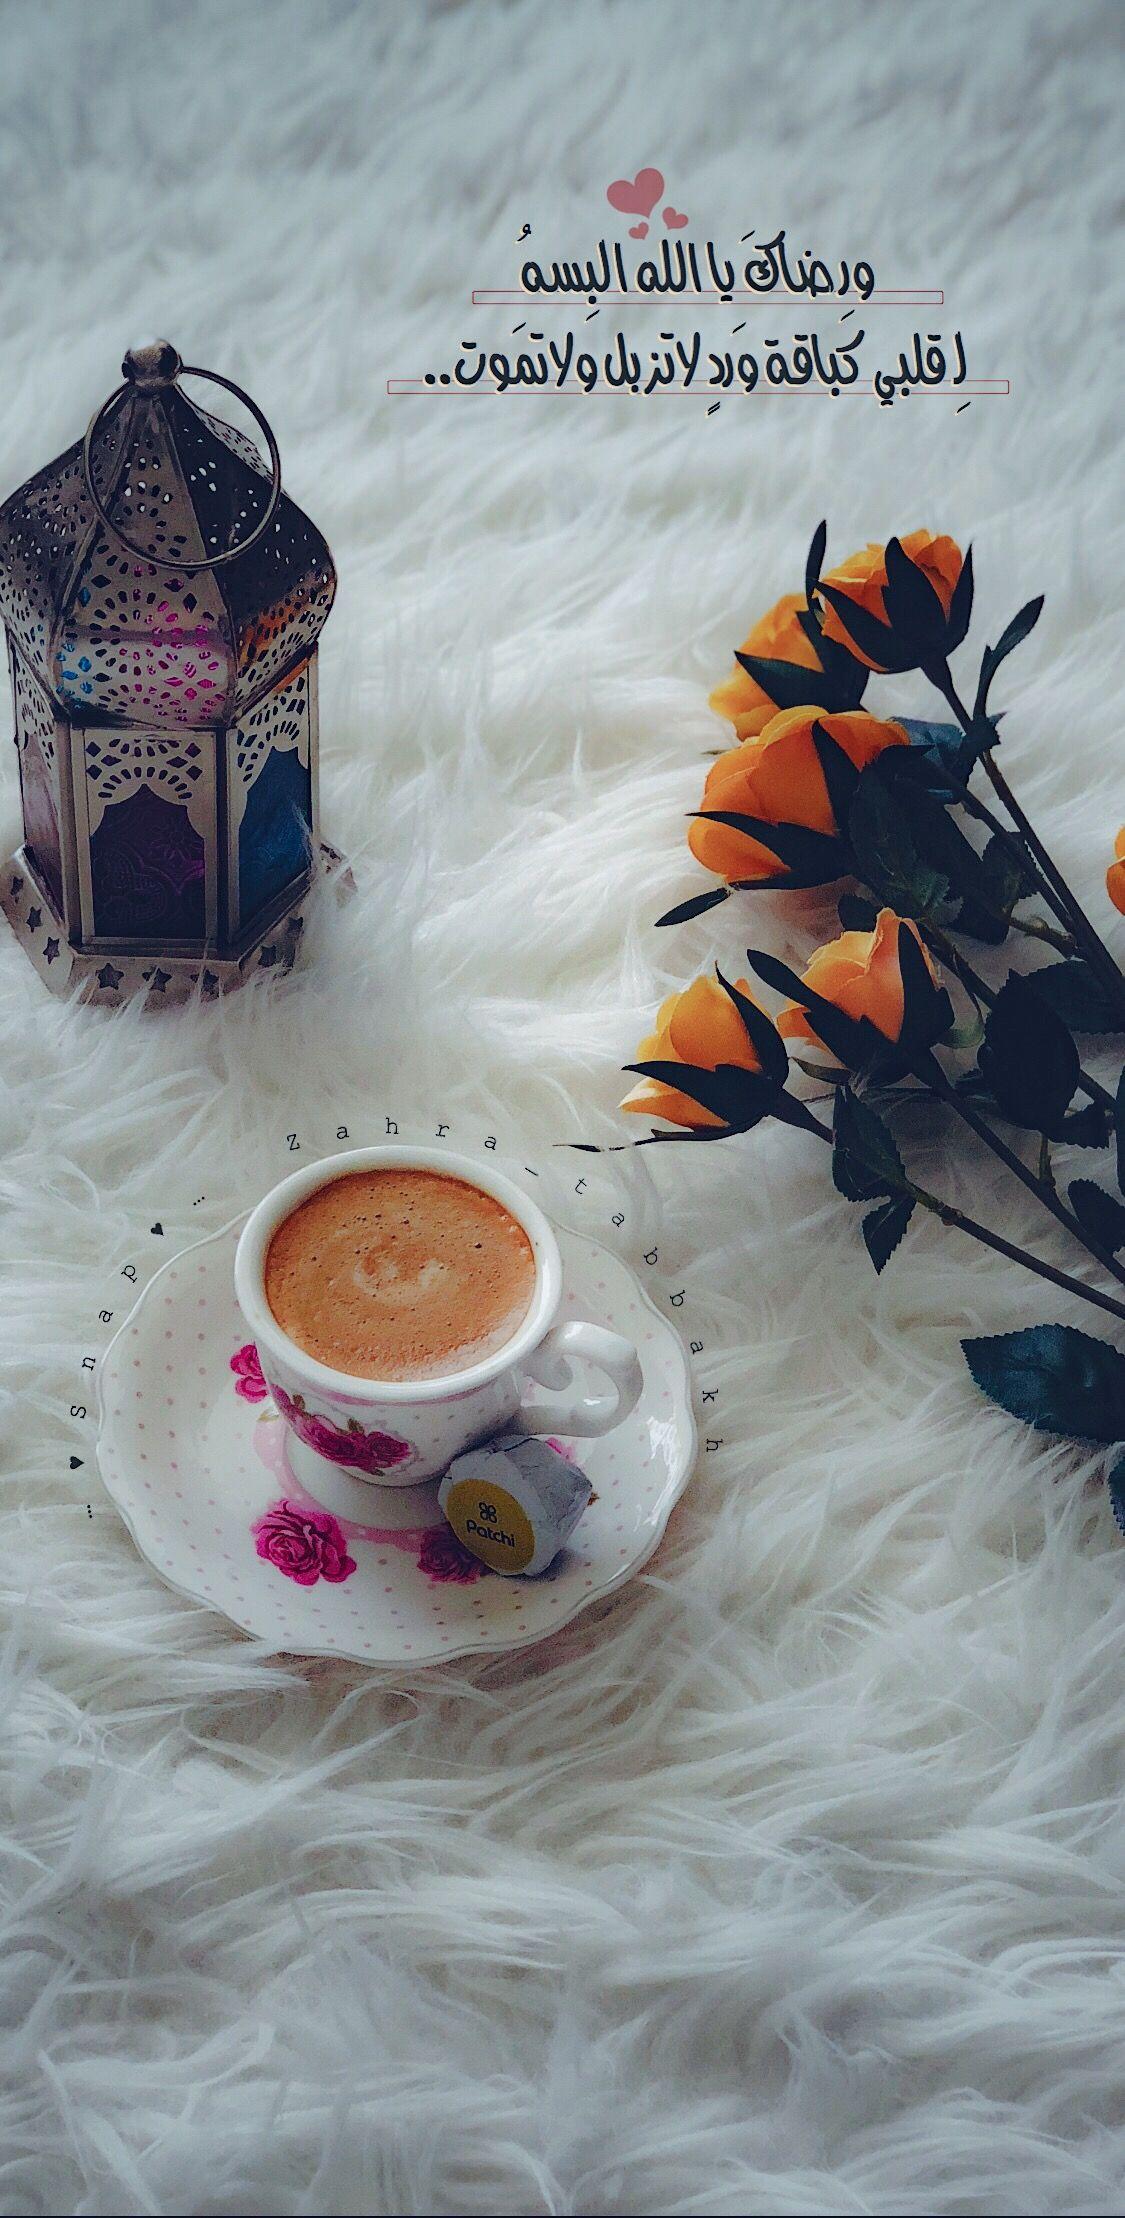 Coffee قهوة قهوتي صباح رمزيات هدوء صباحات Islamic Pictures Prayer For The Day Islam Marriage